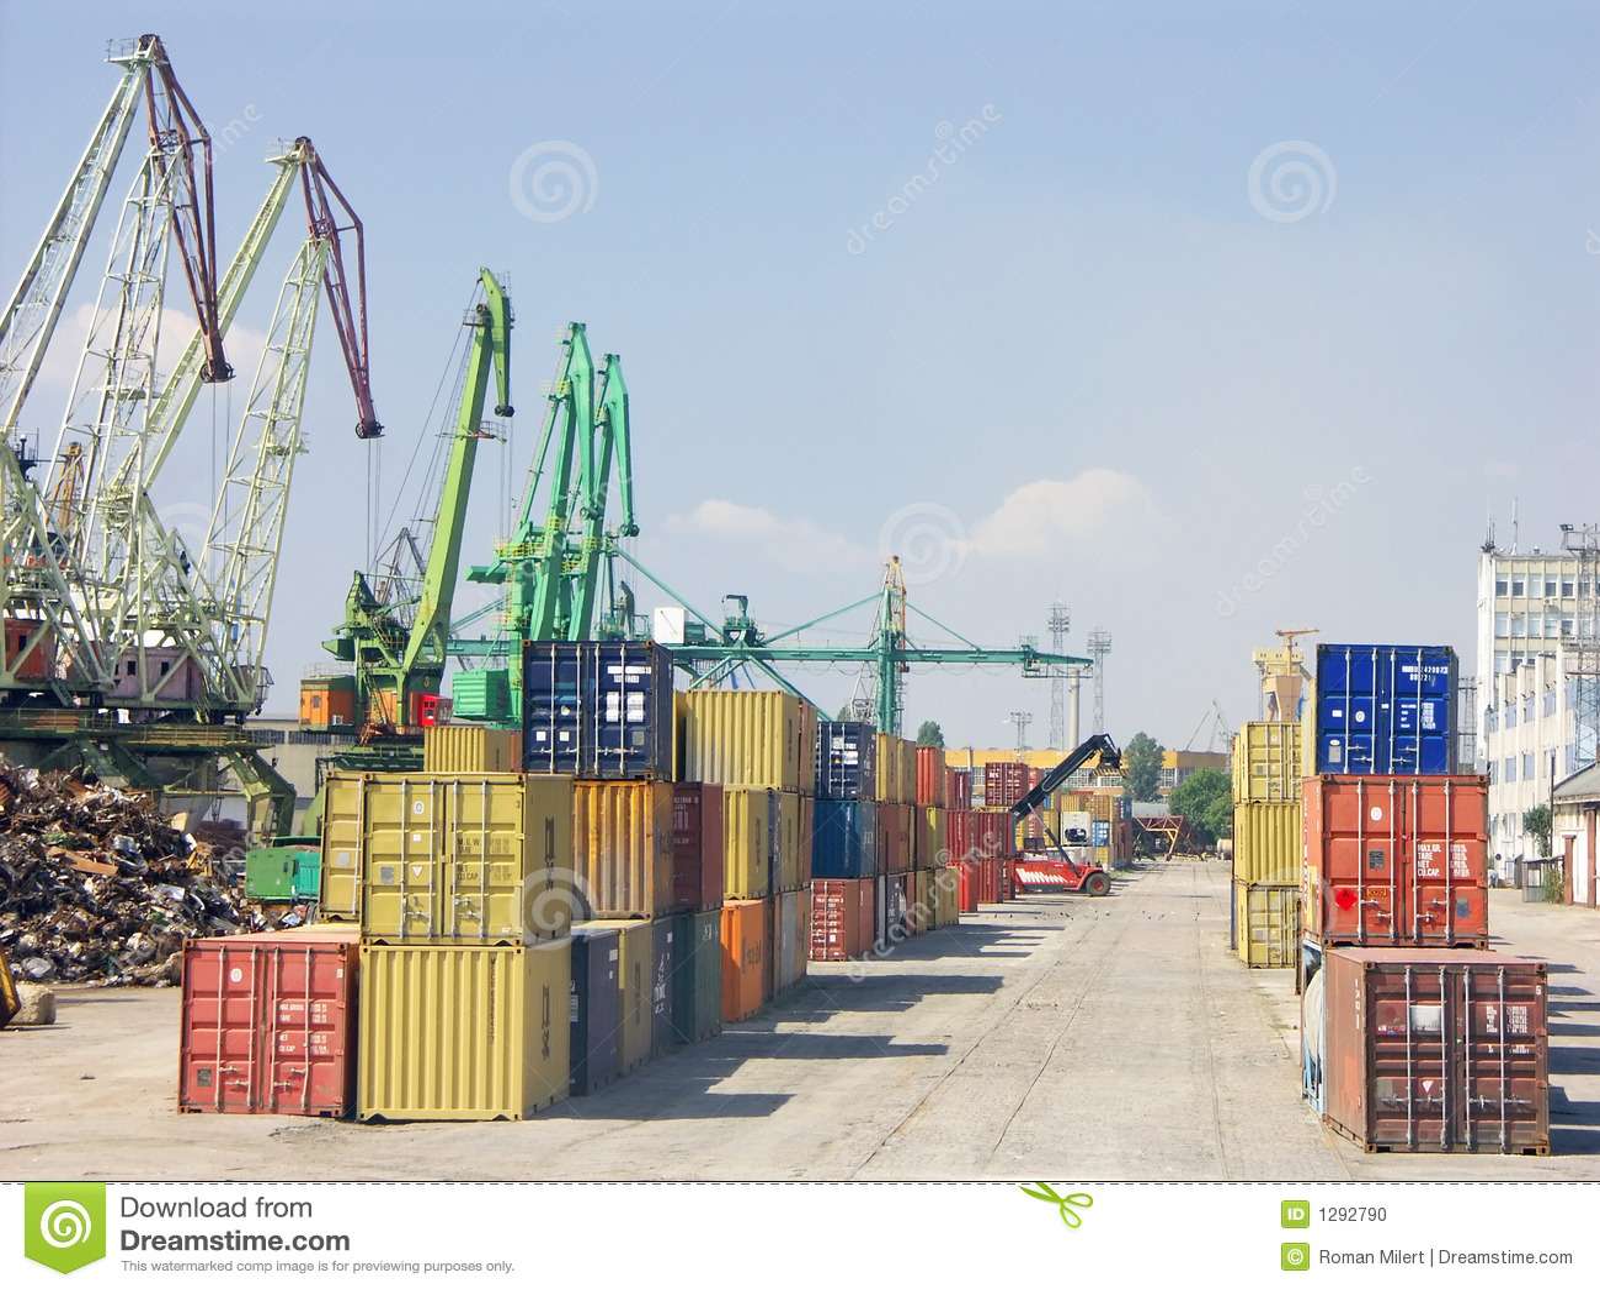 Port of transhipment